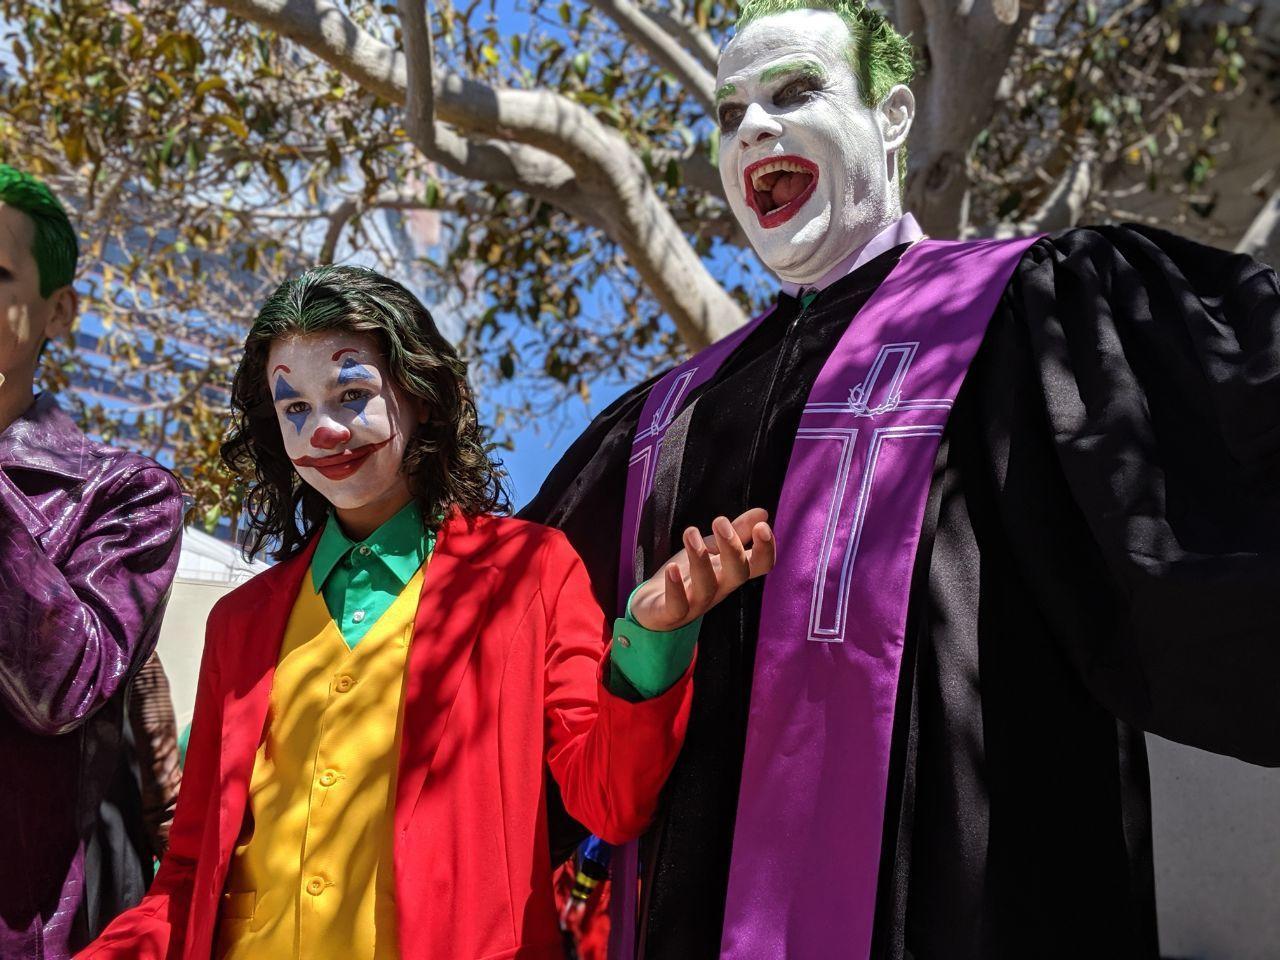 Todd Phillip's Movie & Priest Joker